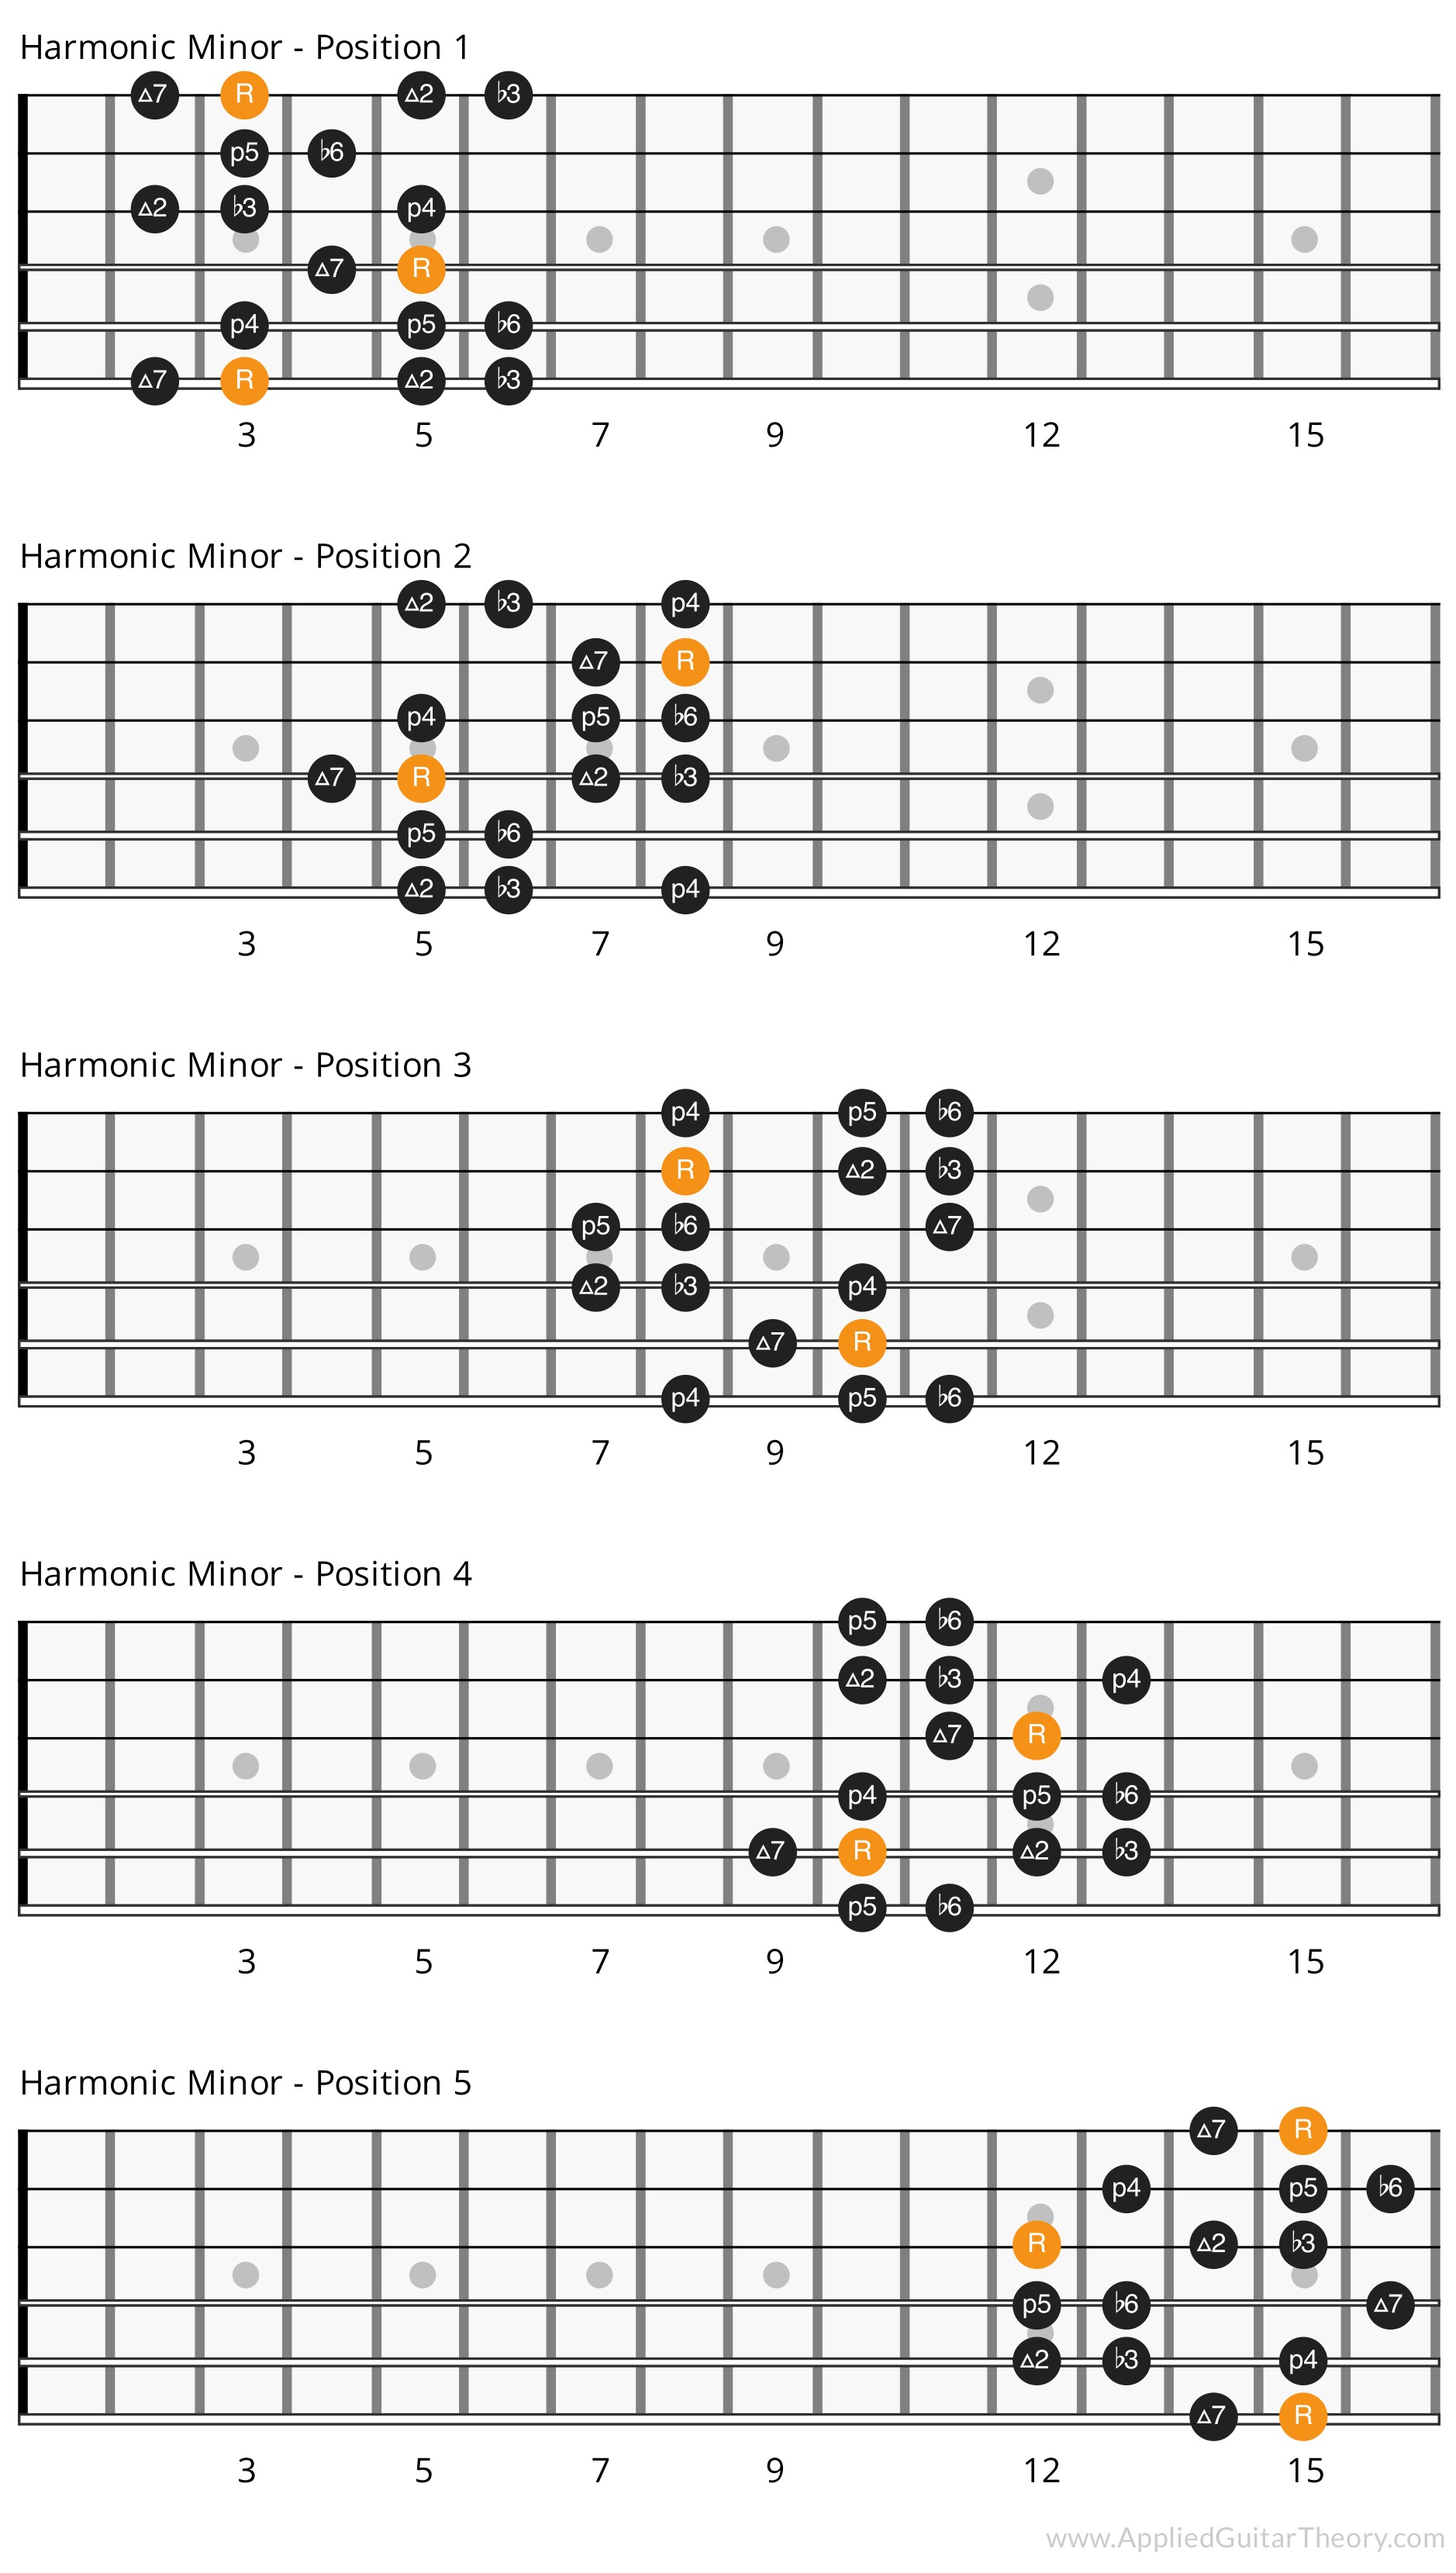 Harmonic minor scale - 5 positions